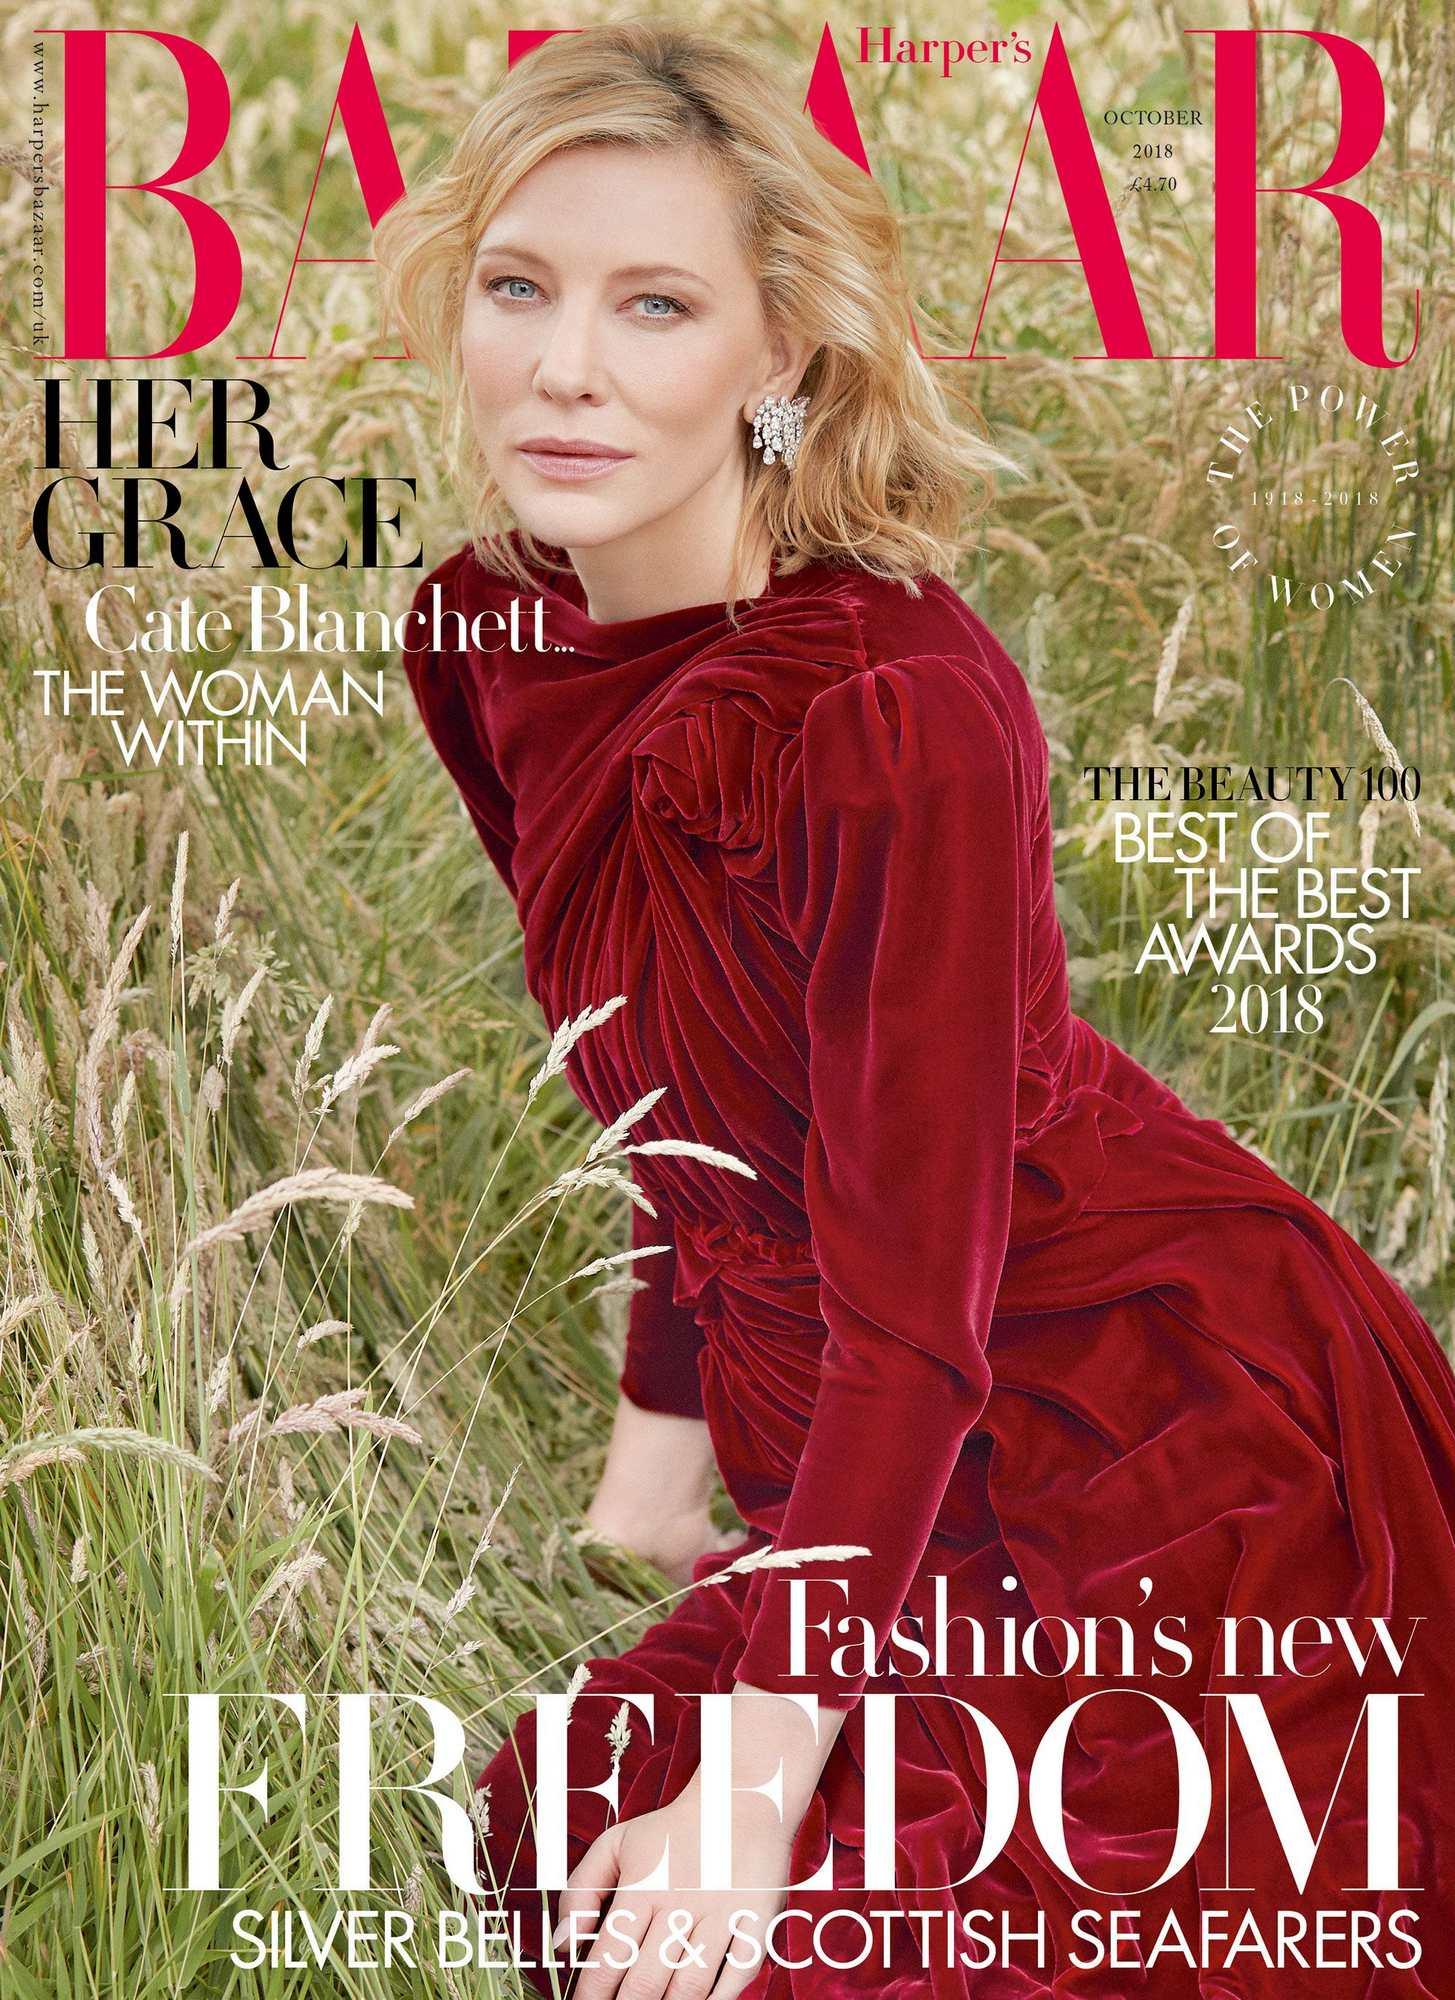 Cate-Blanchett-UK-Harper's-Bazaar-October-20185dec41959145314.jpg